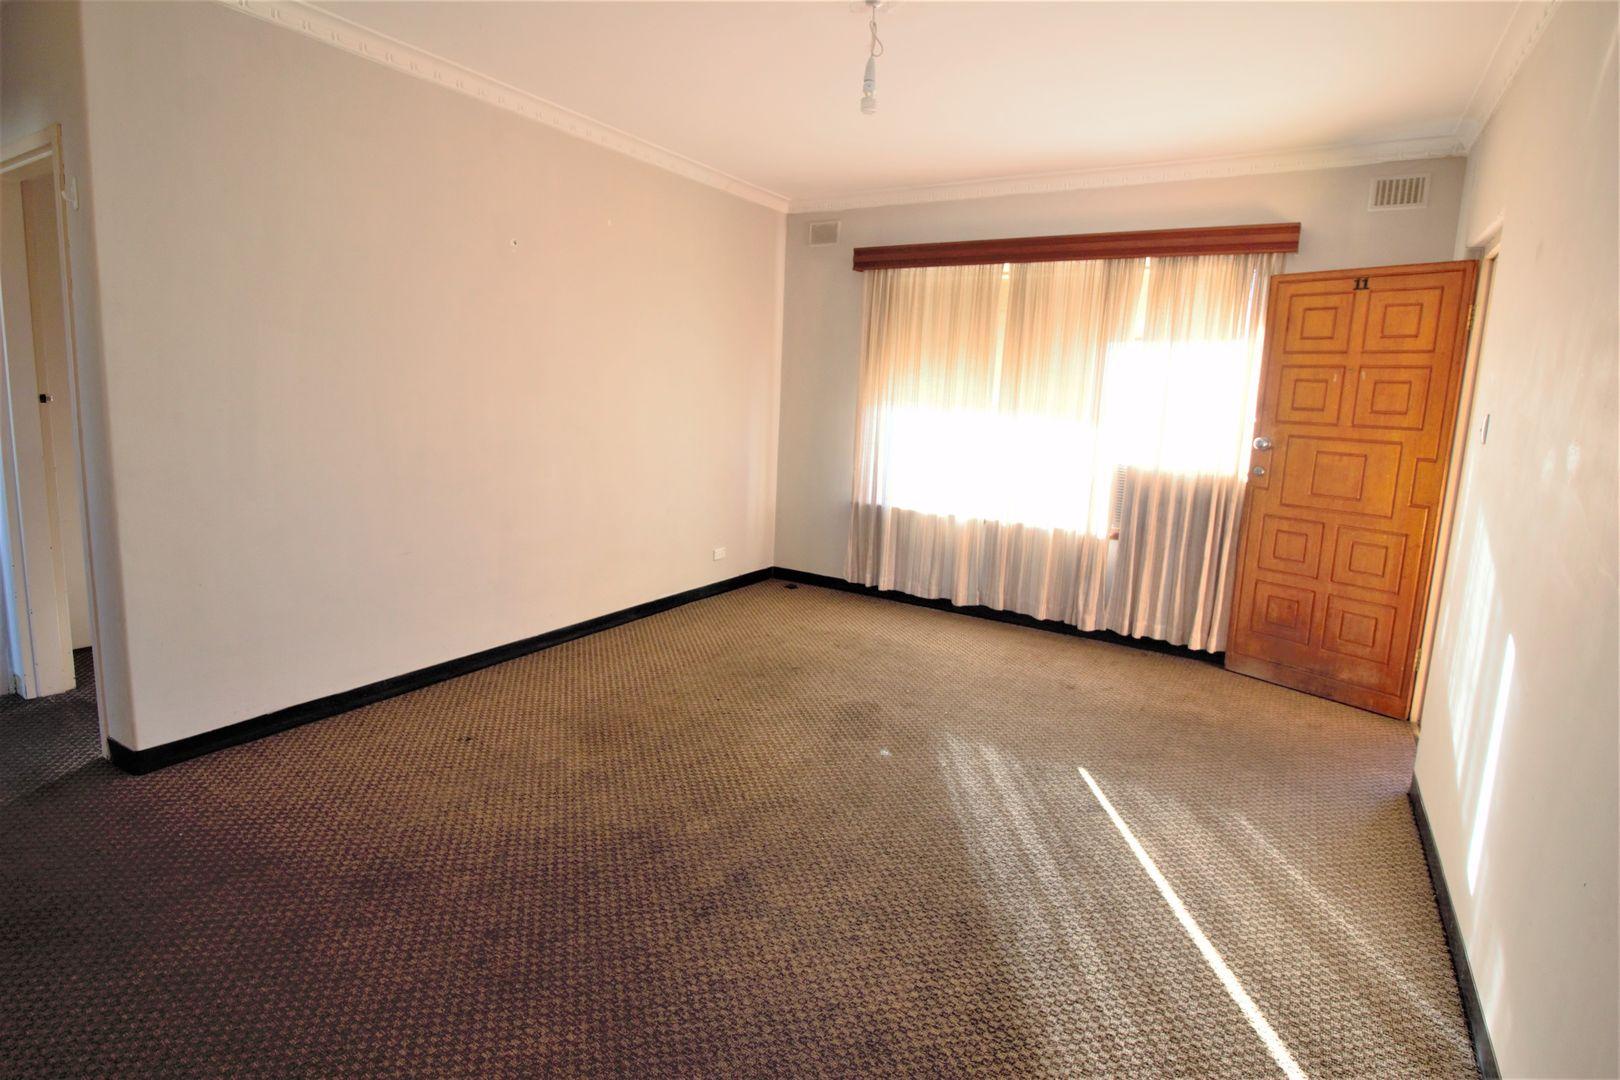 11/177 Jeffcott St, North Adelaide SA 5006, Image 0